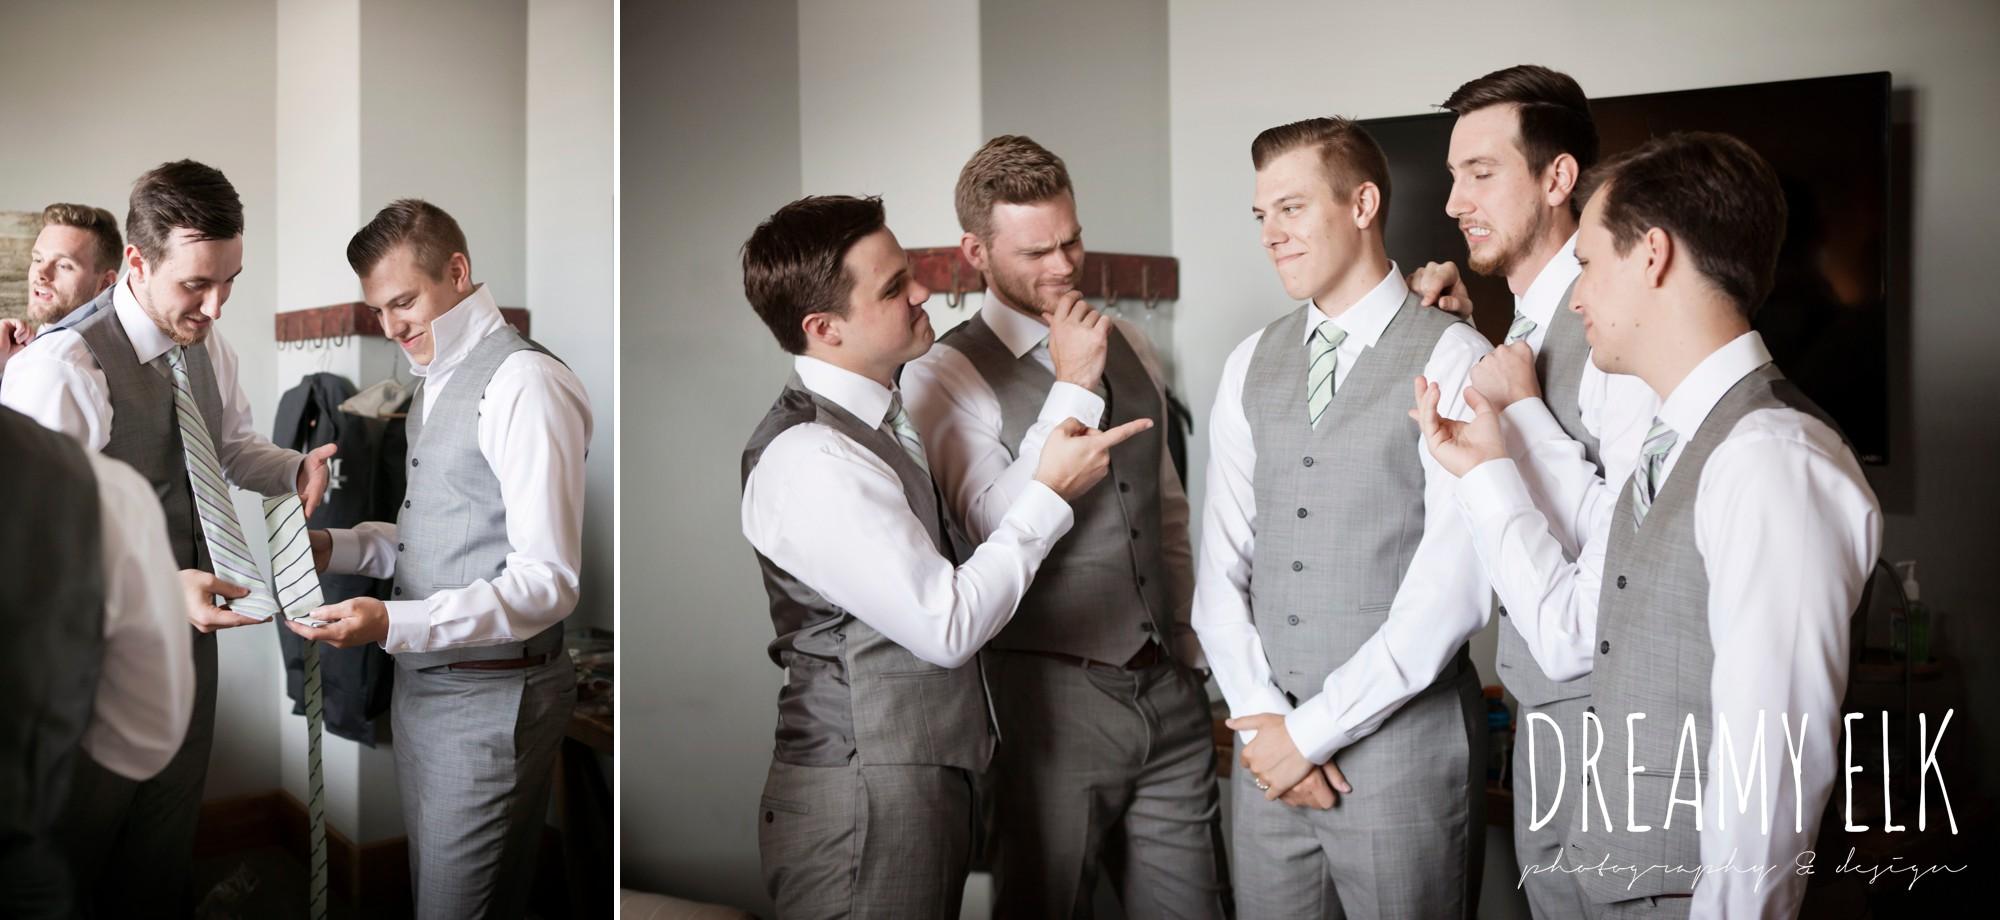 funny groomsmen photo, summer july wedding photo, canyonwood ridge, dripping springs, texas {dreamy elk photography and design}